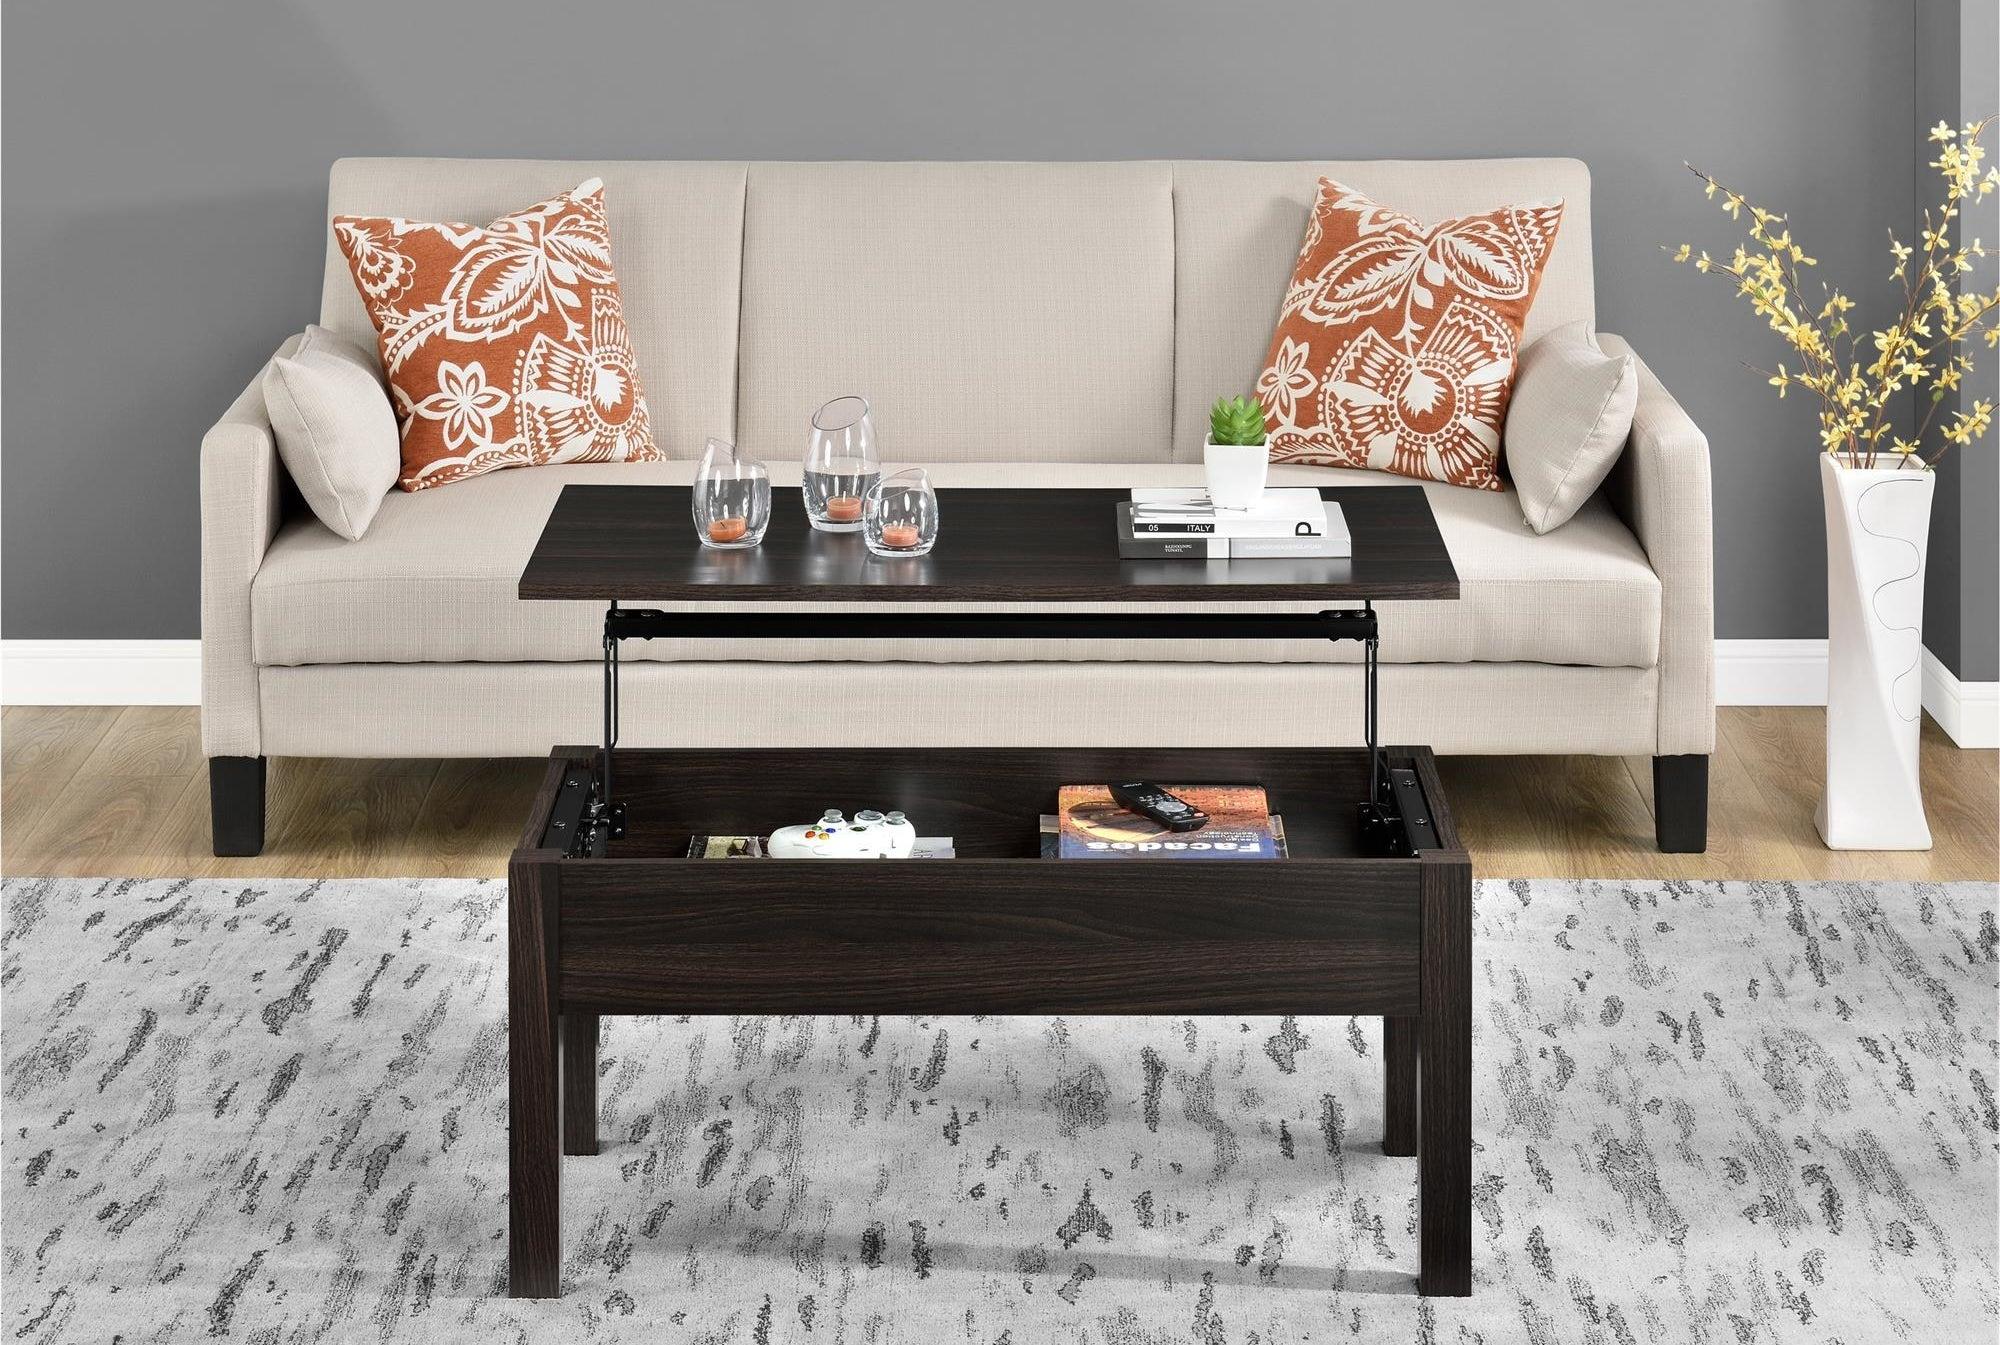 Lift-top dark wood coffee table